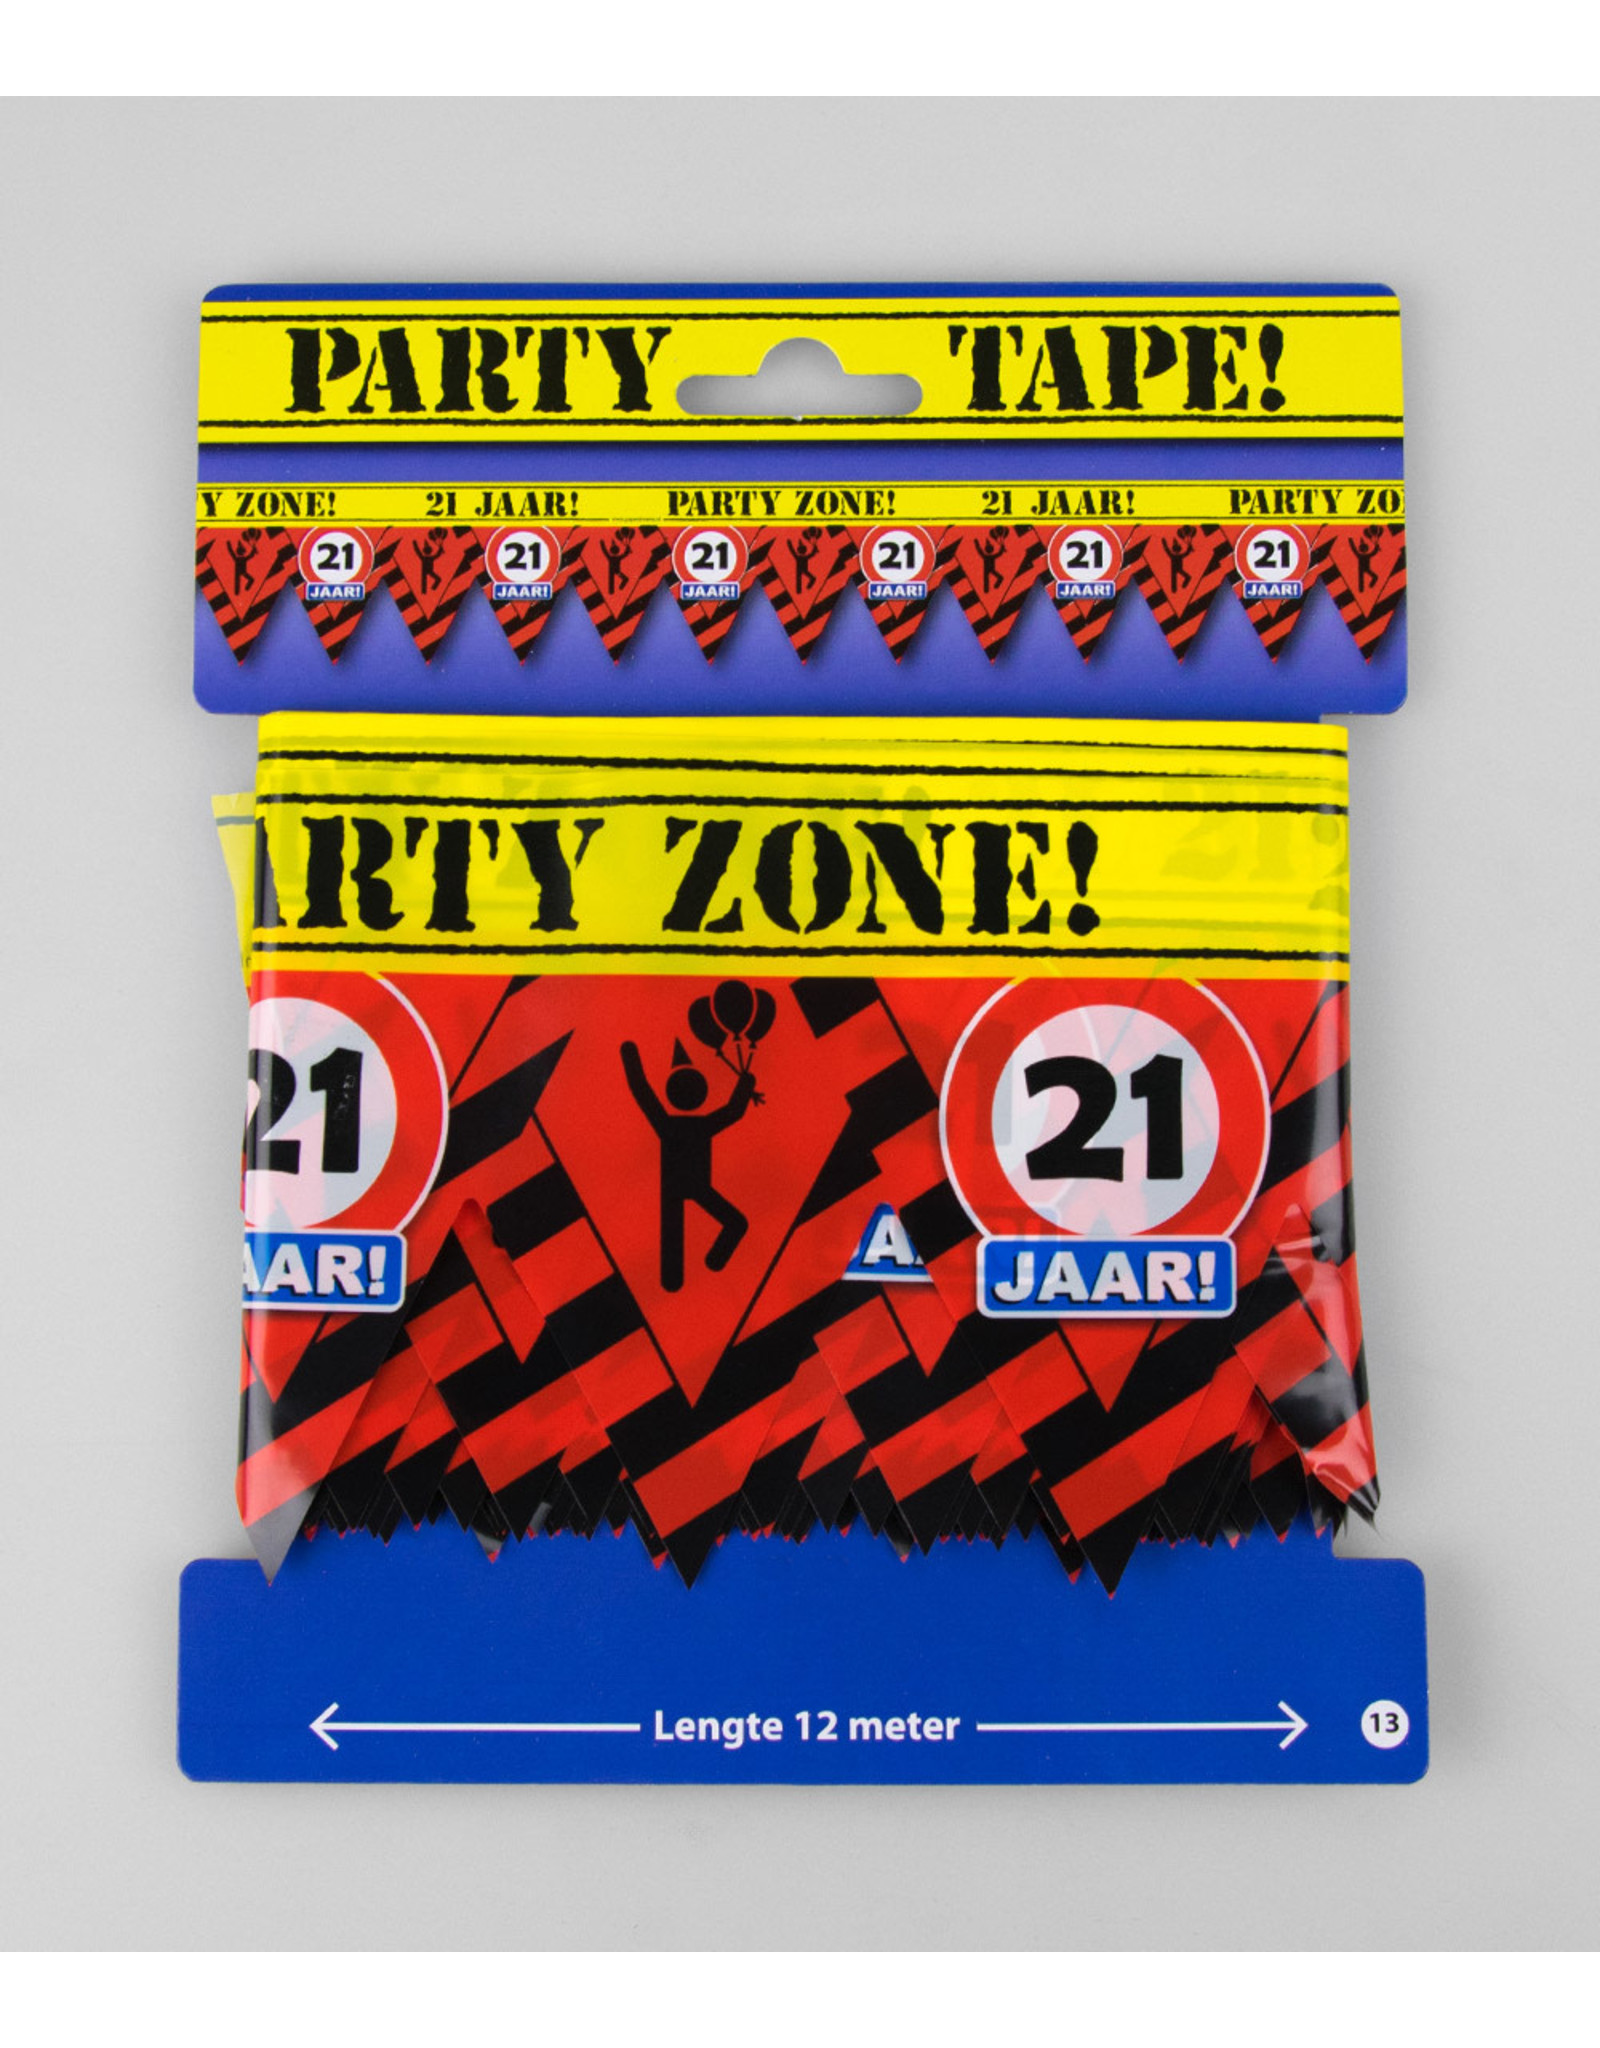 Afzetlint party zone 21 jaar